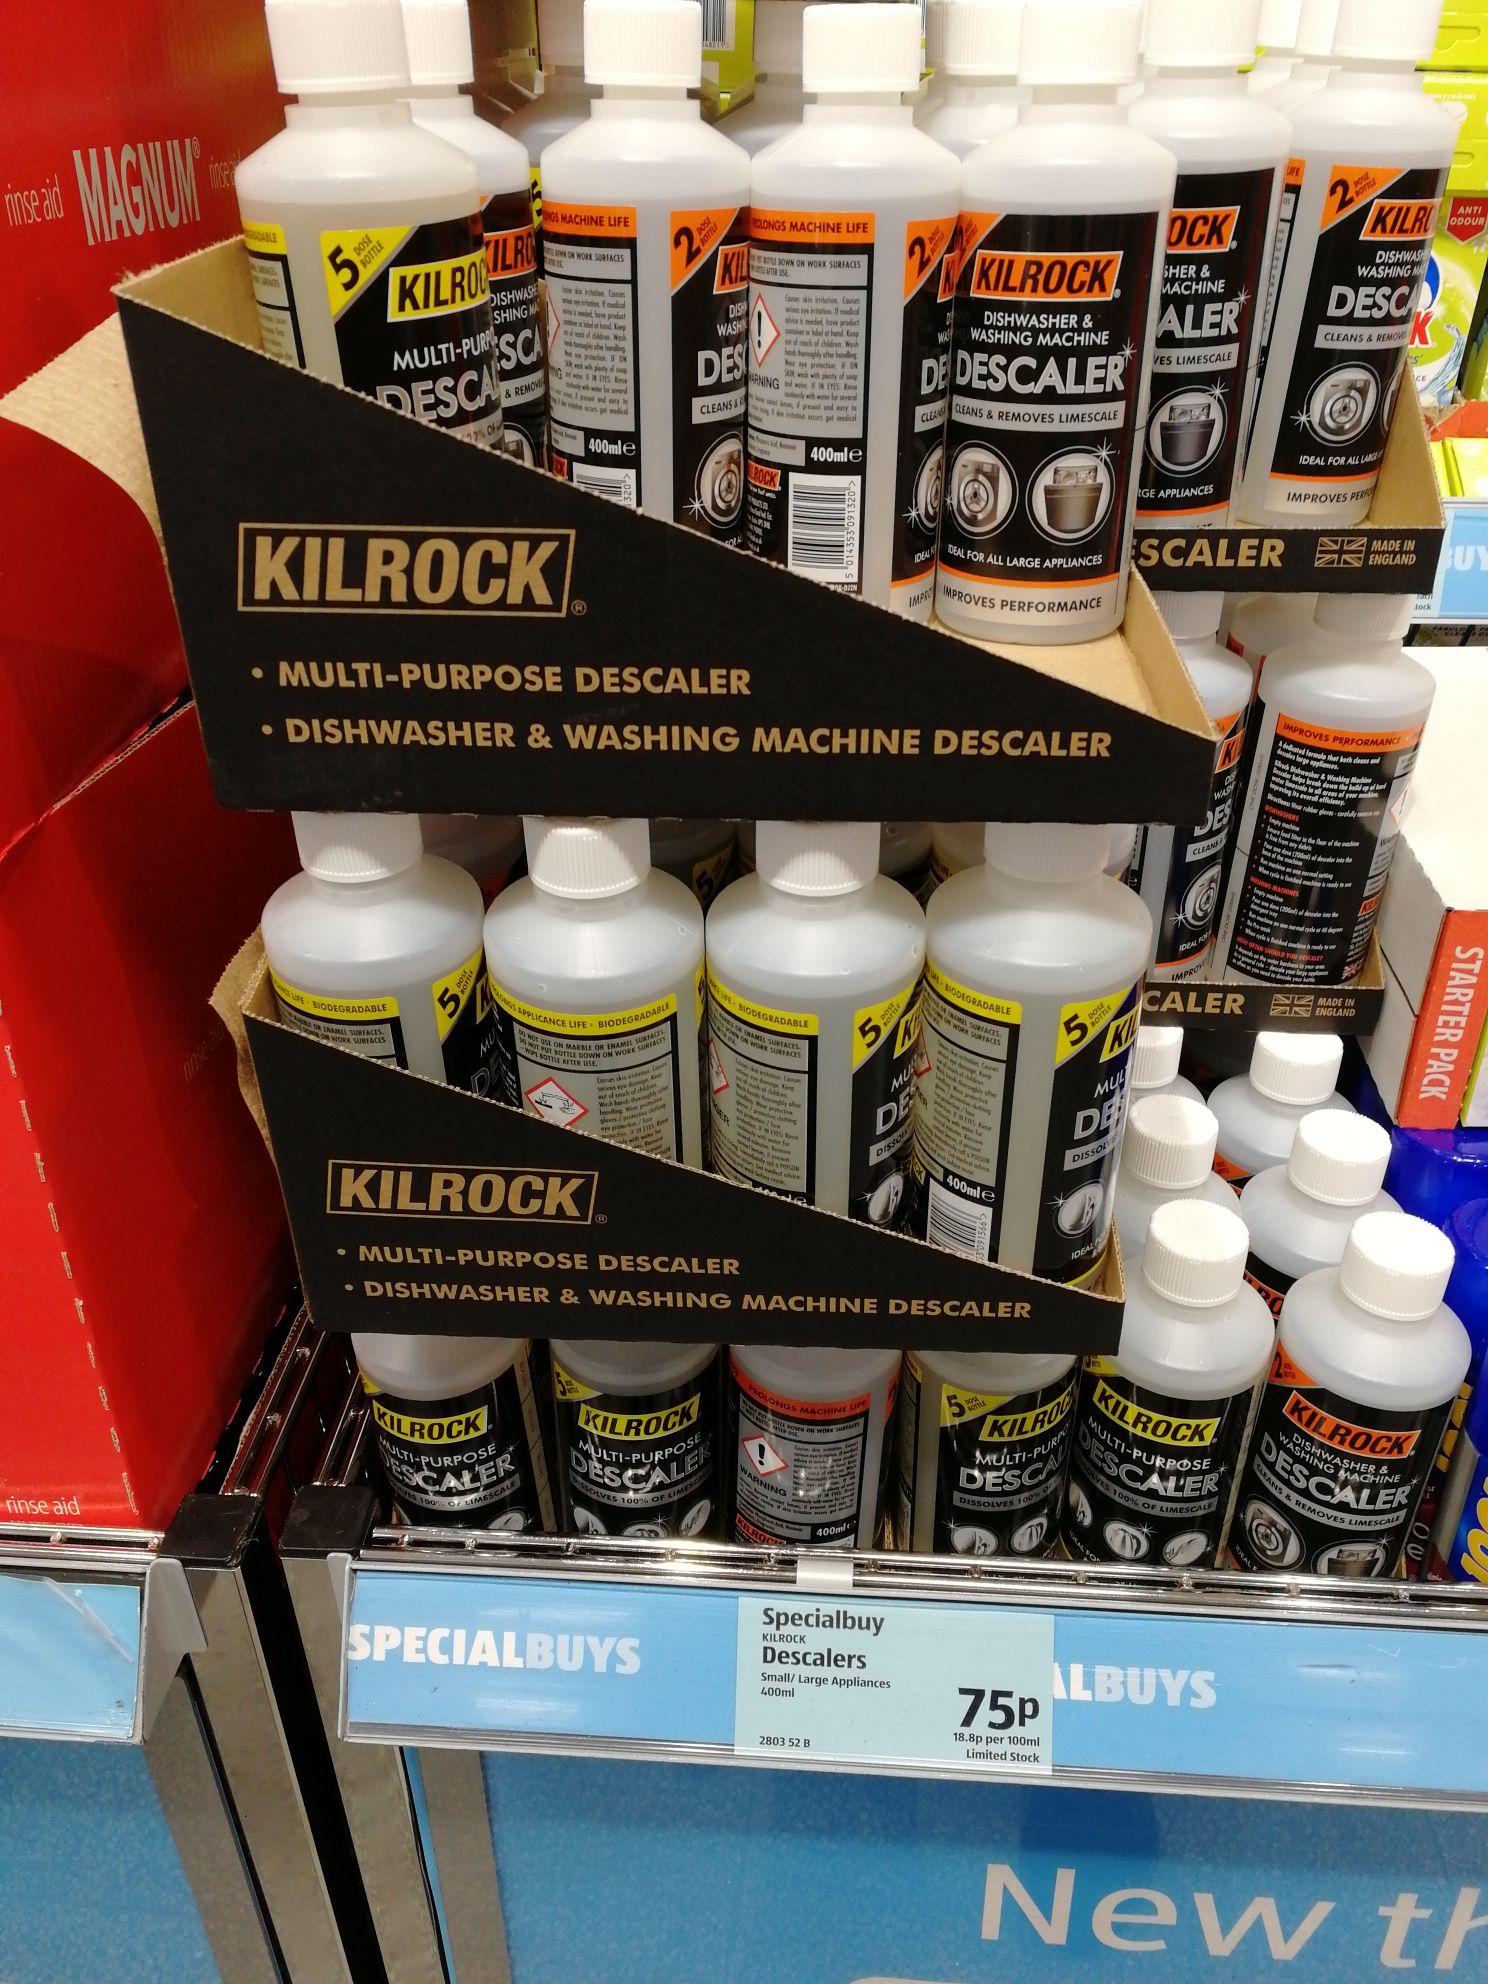 Kilrock Aldi 75p (High Wycombe)